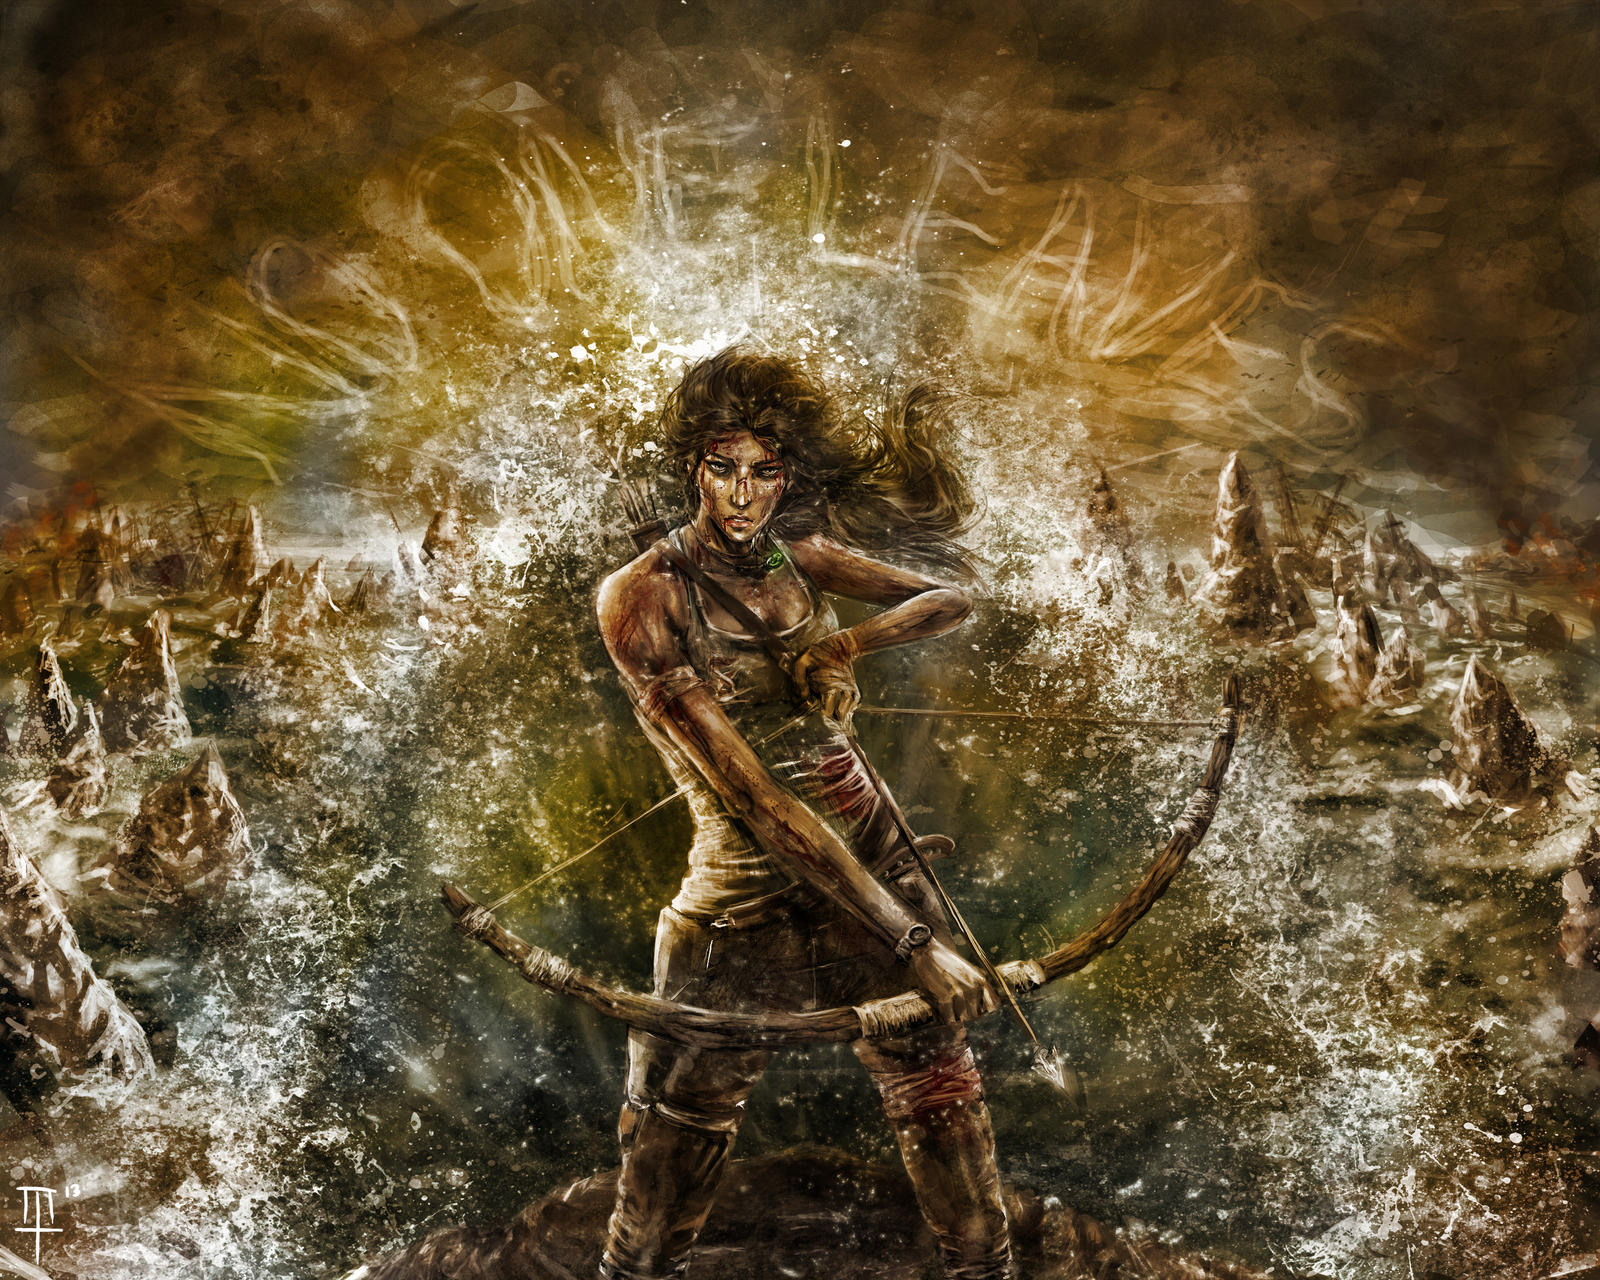 Lara's Burden by MarcusThomas